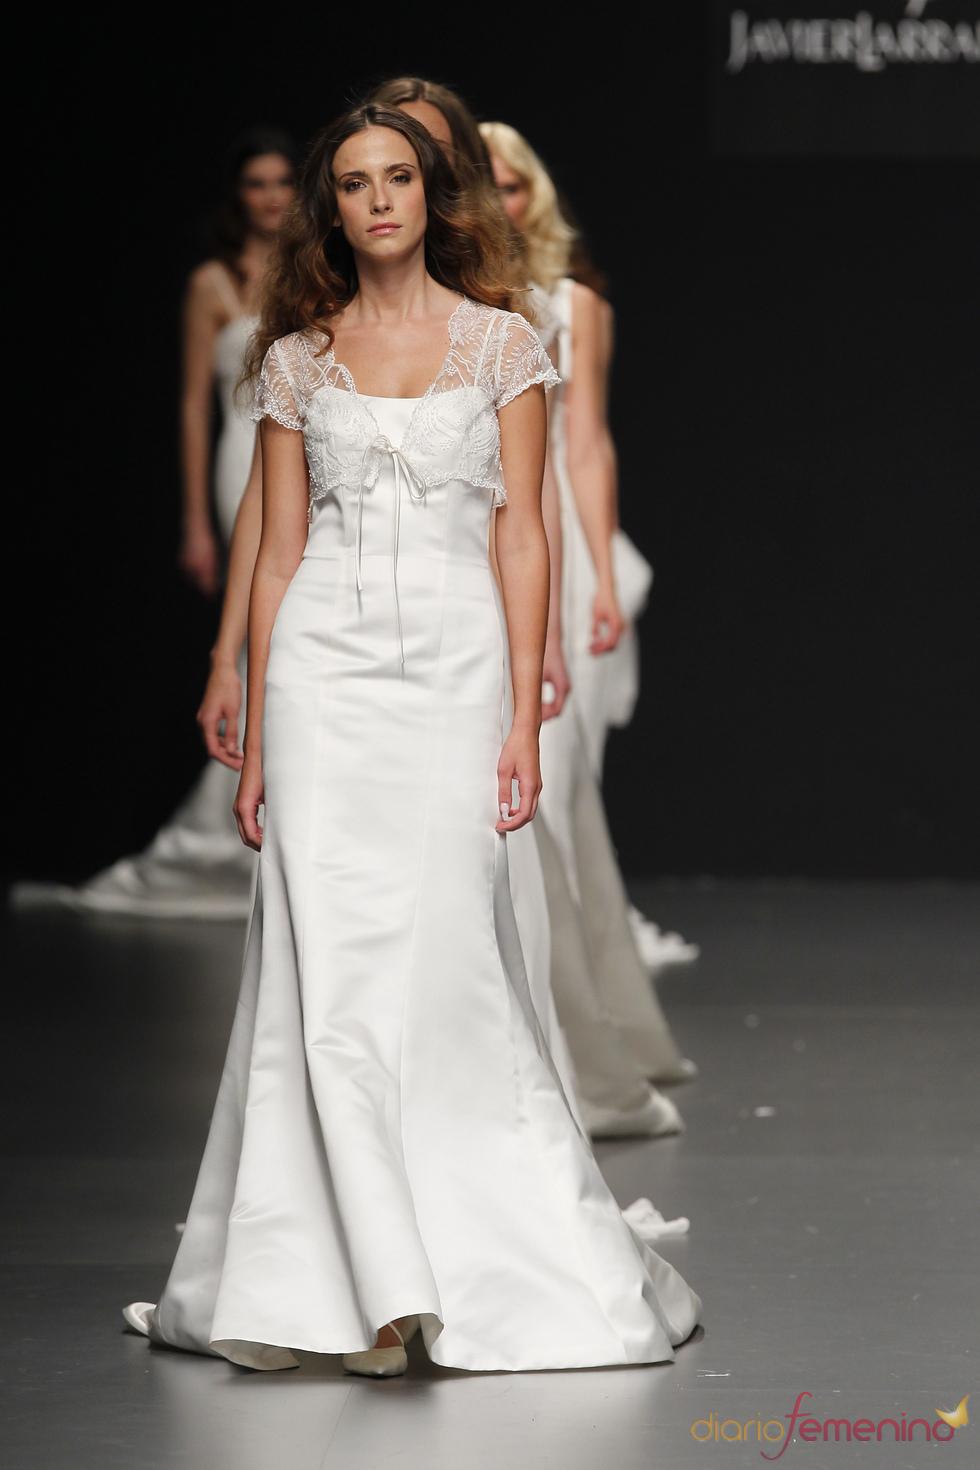 Elegante vestido de novia de Javier Larrainzar